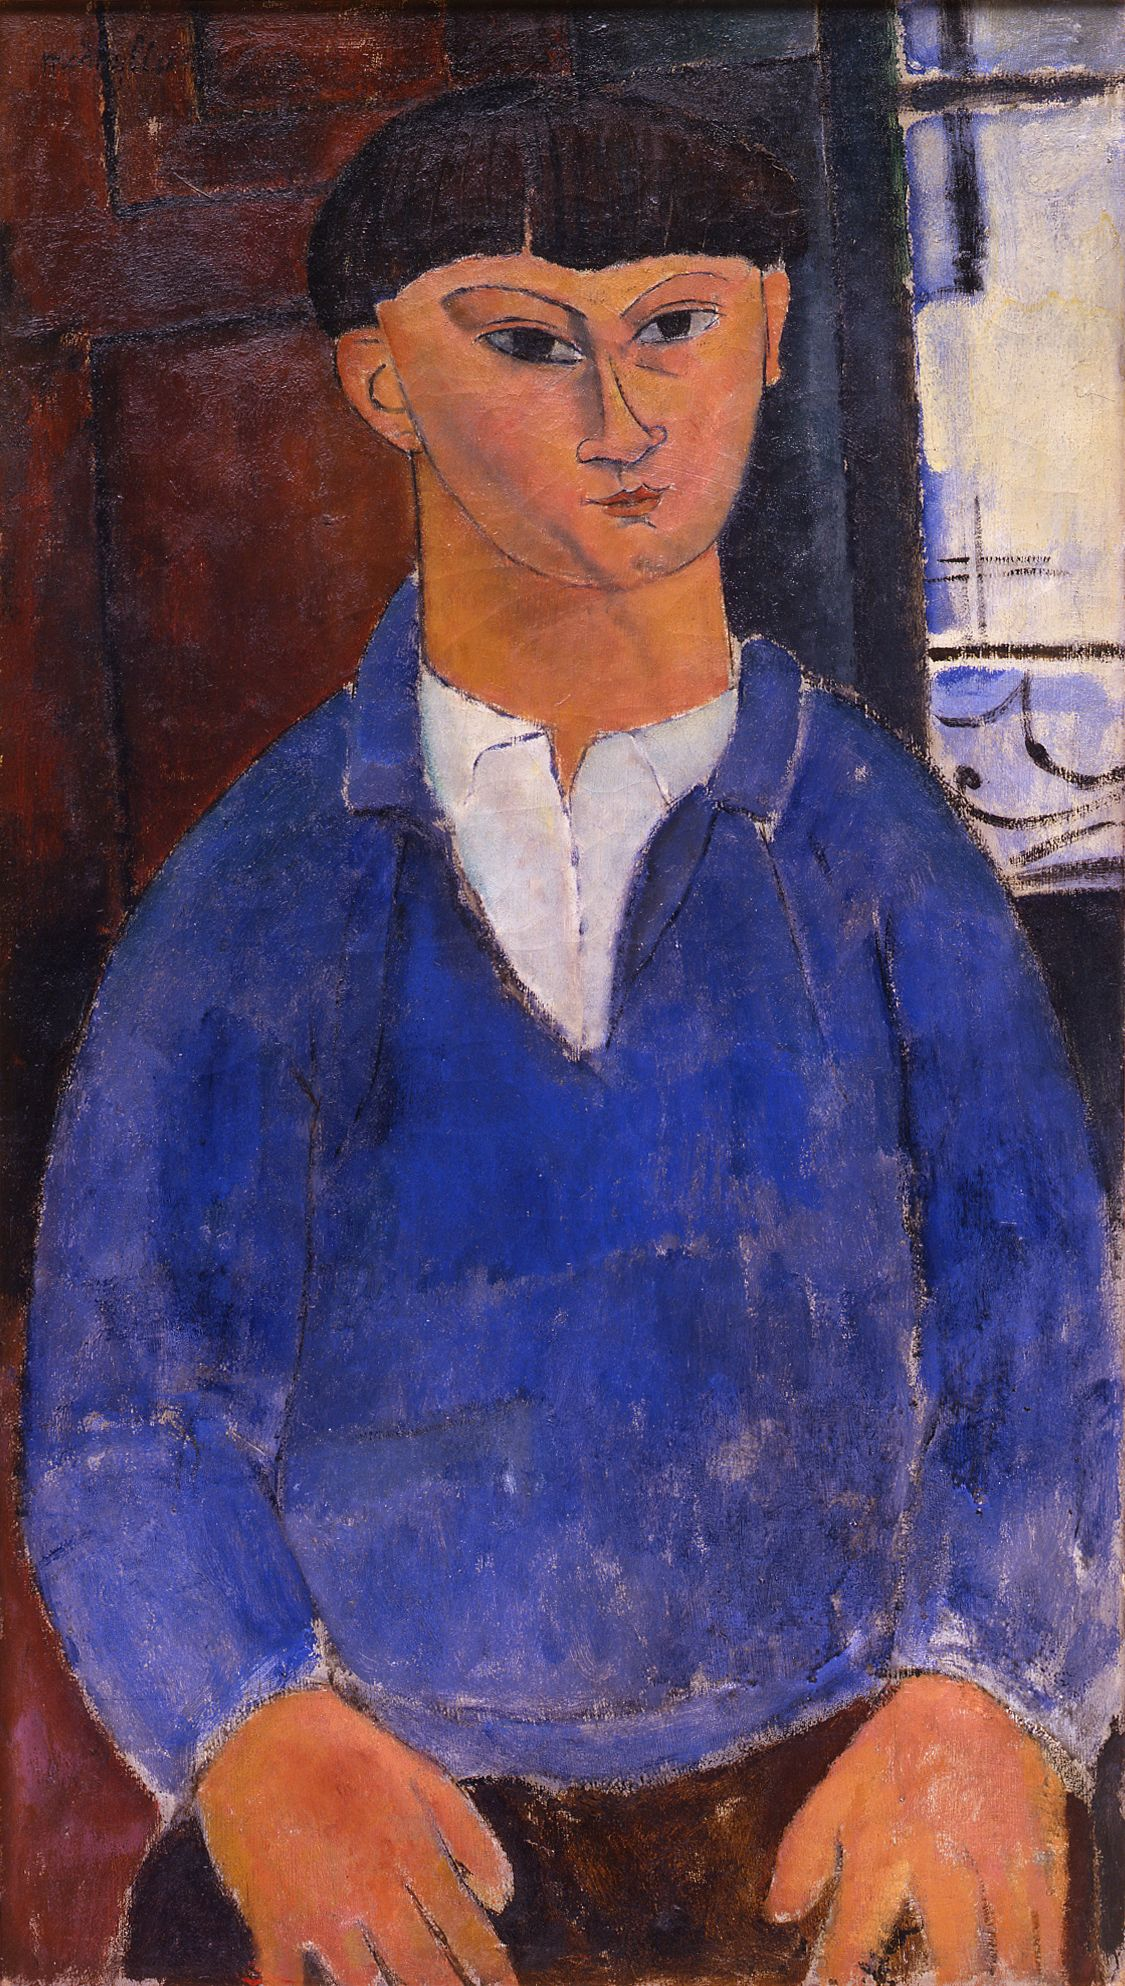 Artwork file SecretModigliani | Amédéo modigliani, Modigliani, L'art du  portrait